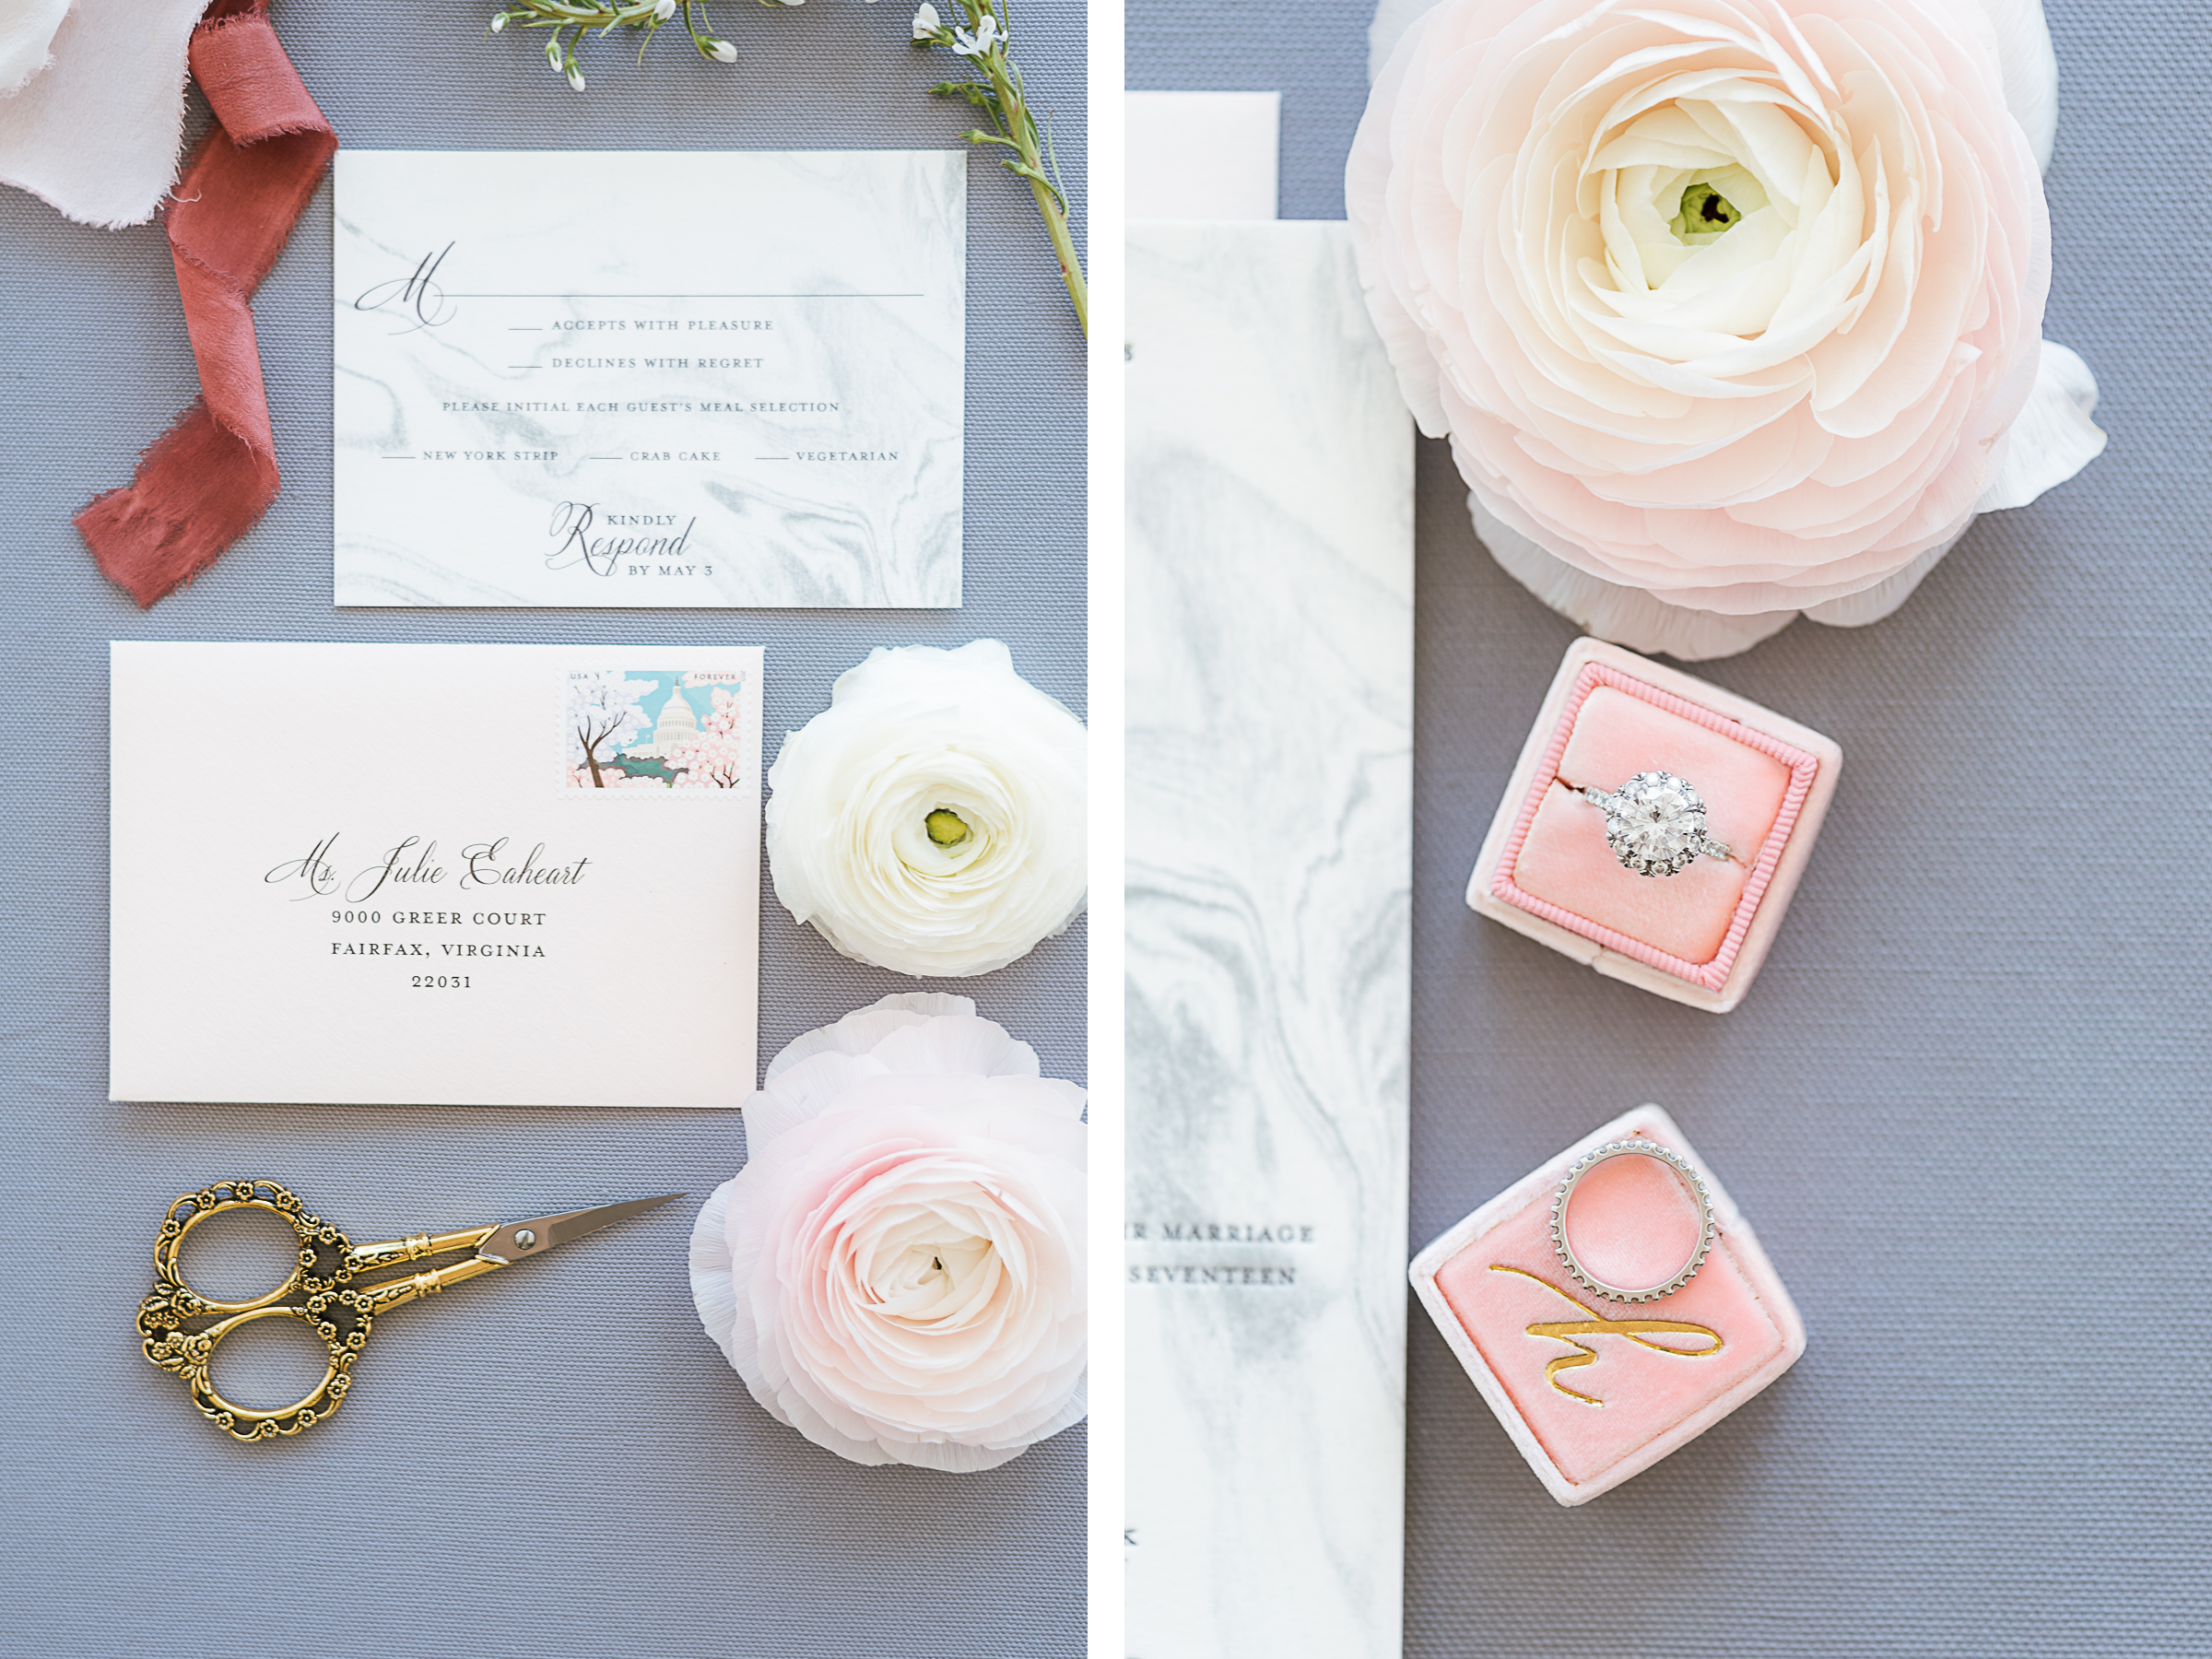 MD-Wedding-Photographer-Styling-Silk-Ribbon-Jefferson-Lane-Designs-15.jpg